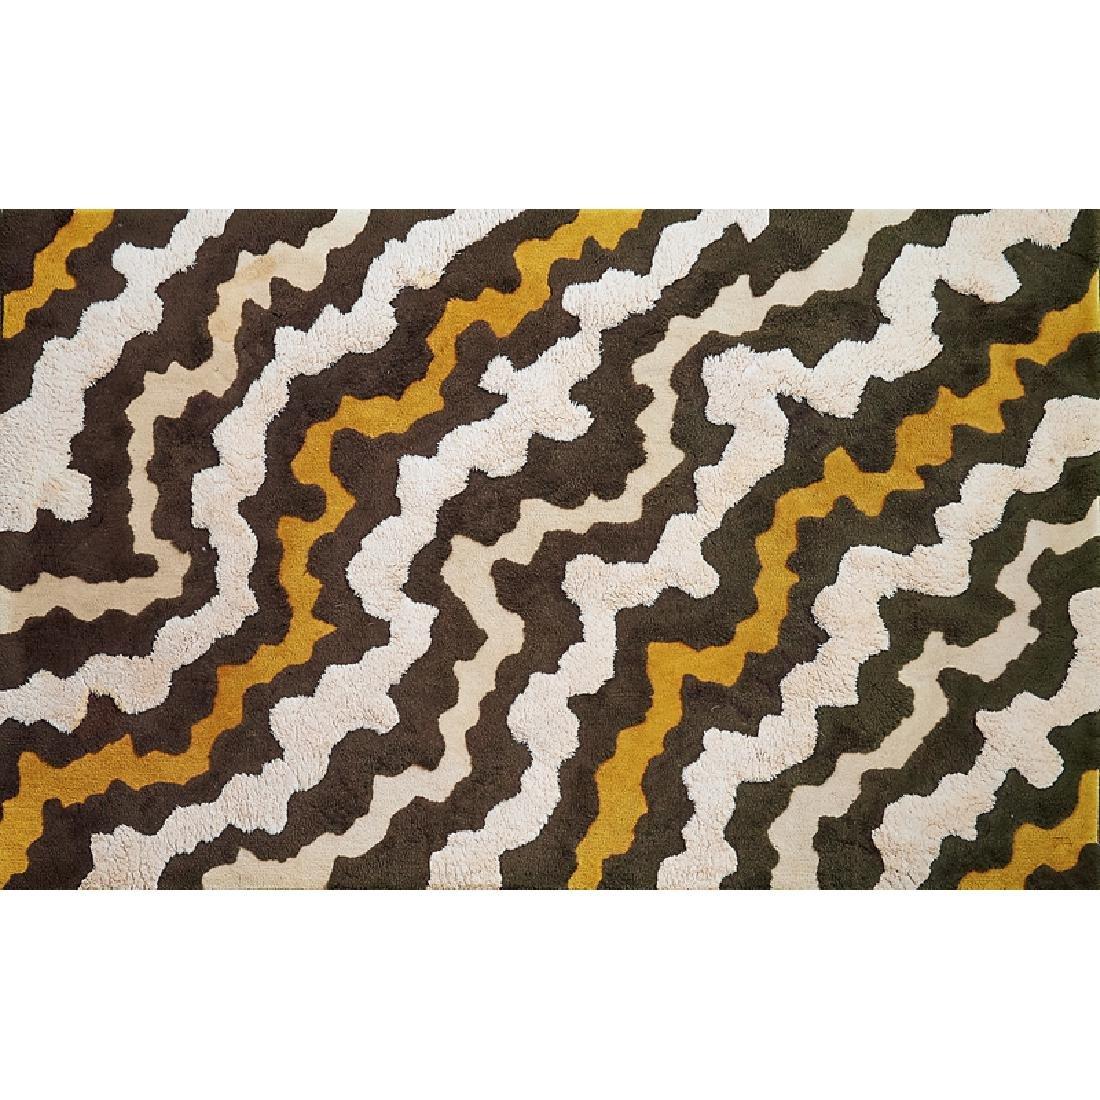 EDWARD FIELDS Wool rug